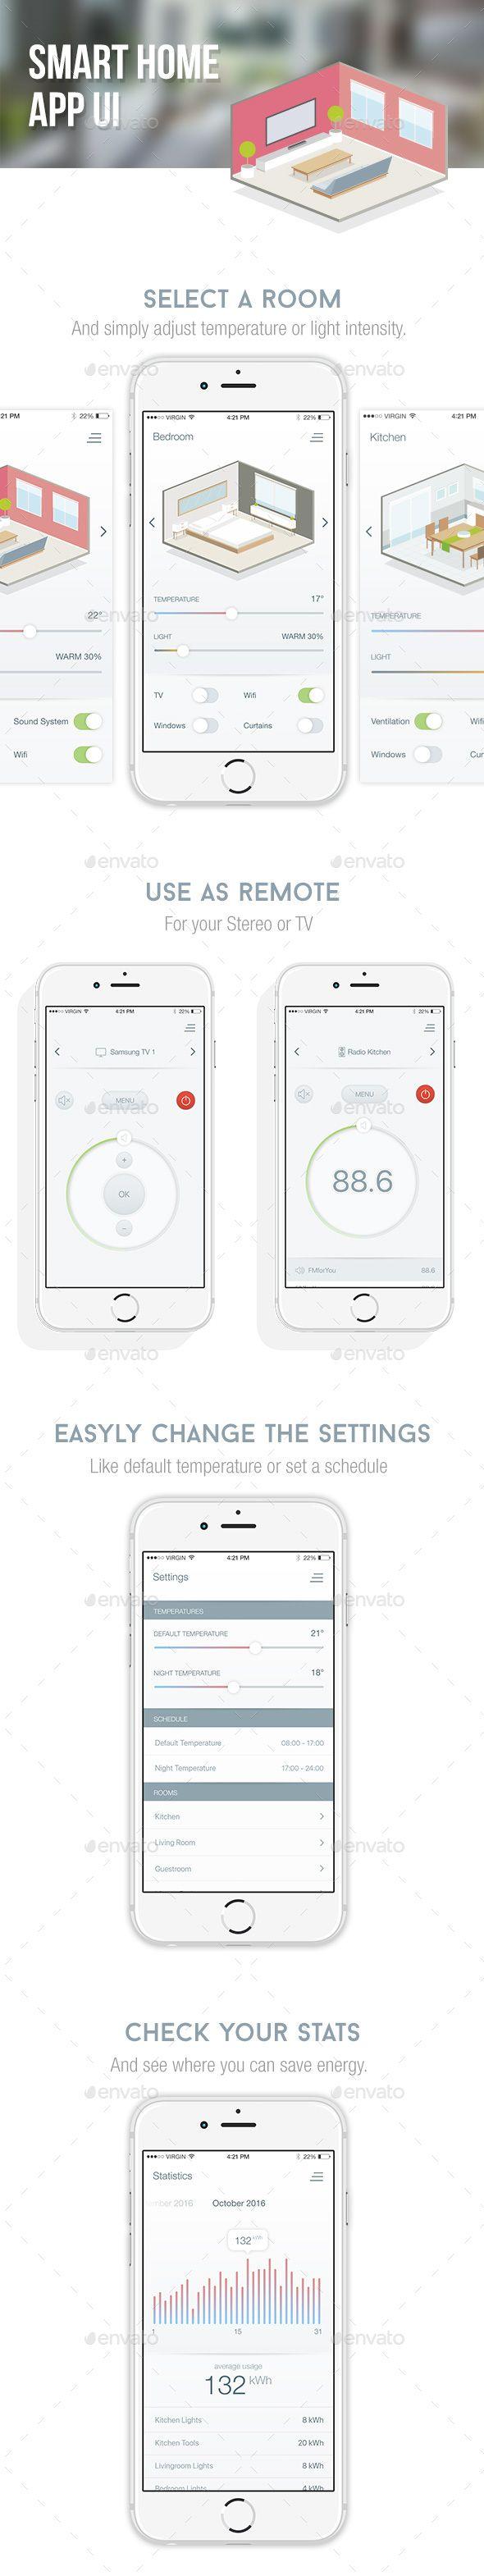 best 25 ui design software ideas on pinterest ux ui designer smart home app ui